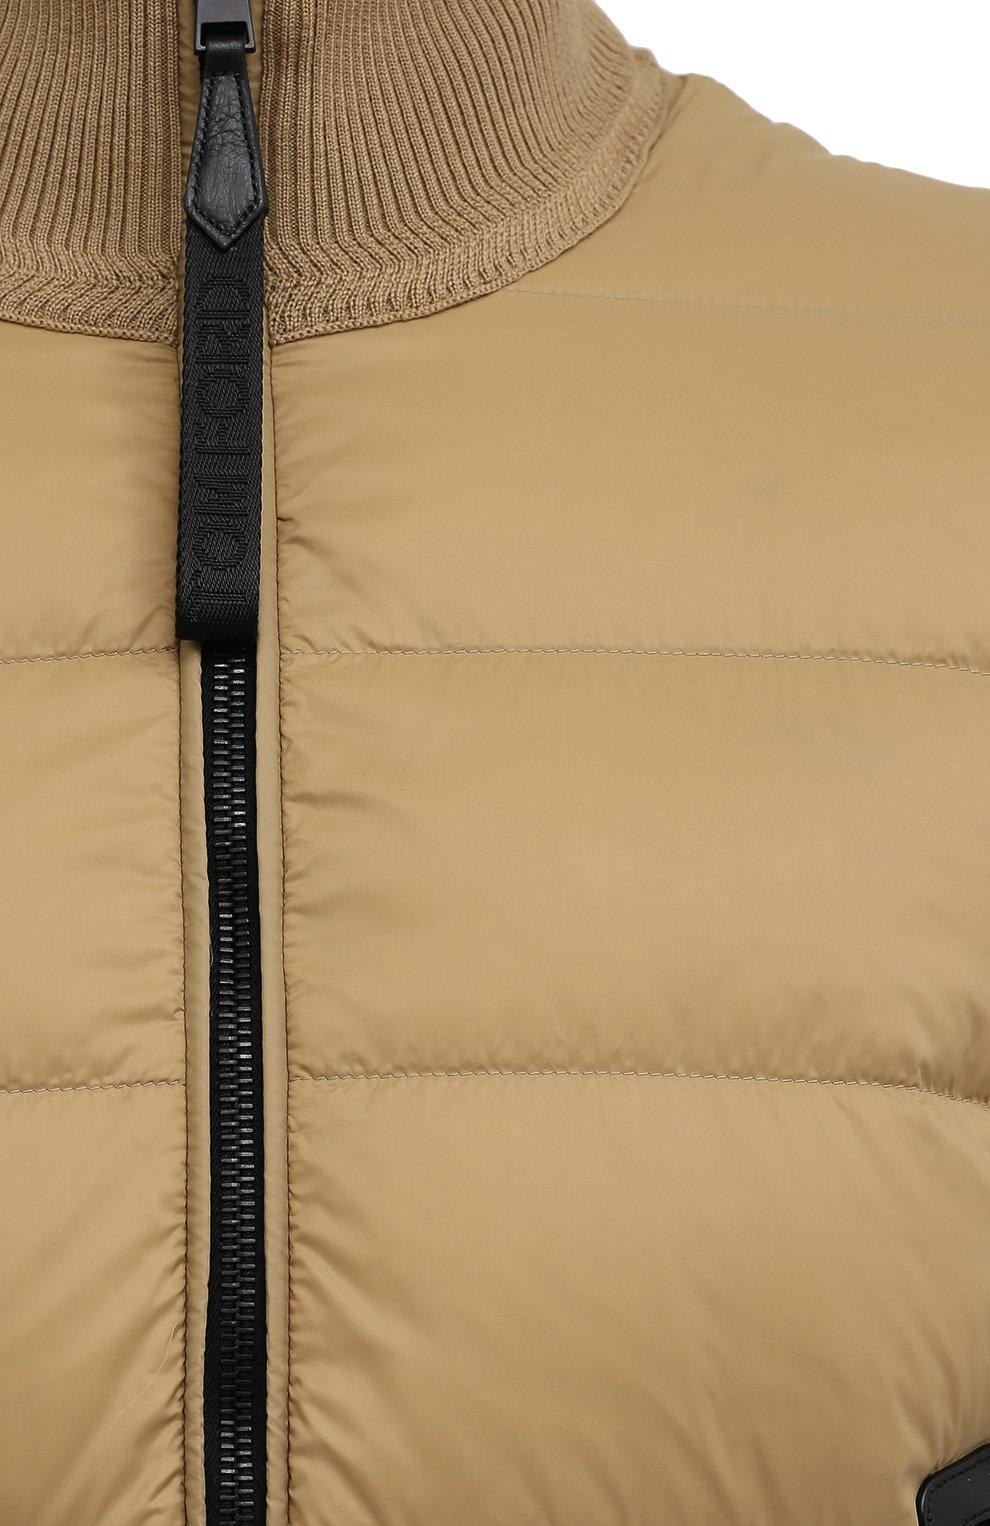 Мужской комбинированный кардиган TOM FORD бежевого цвета, арт. BWM2Y/TFK157 | Фото 5